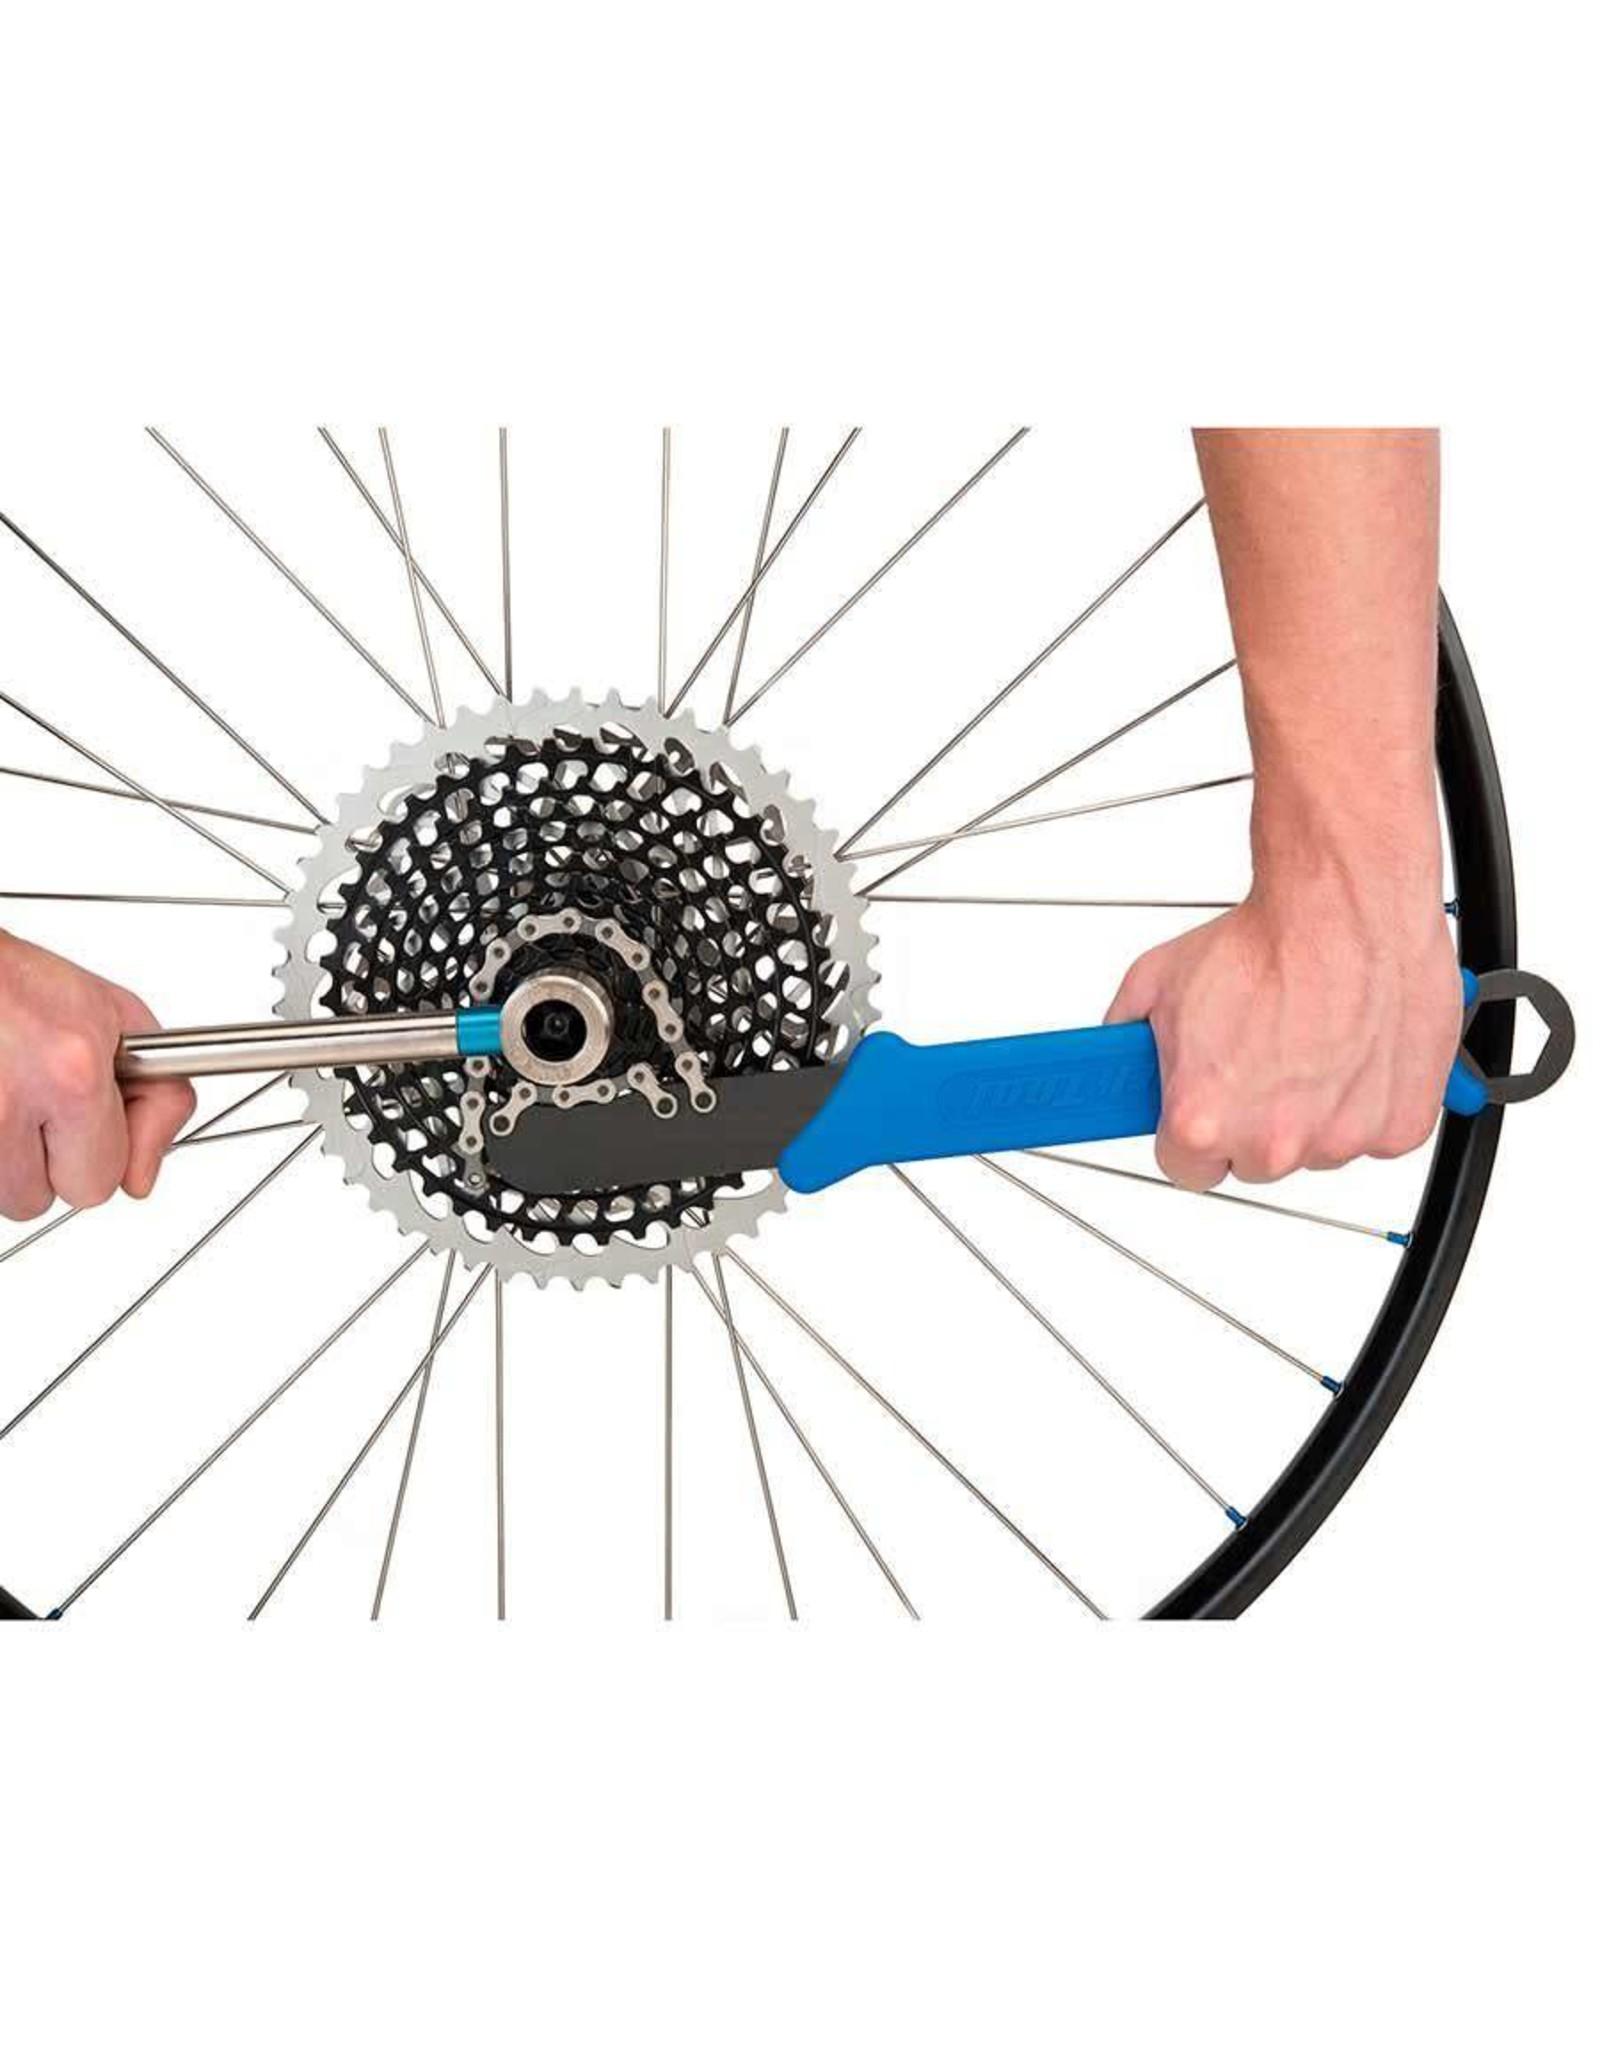 Park tool Chain whip, SR-12.2